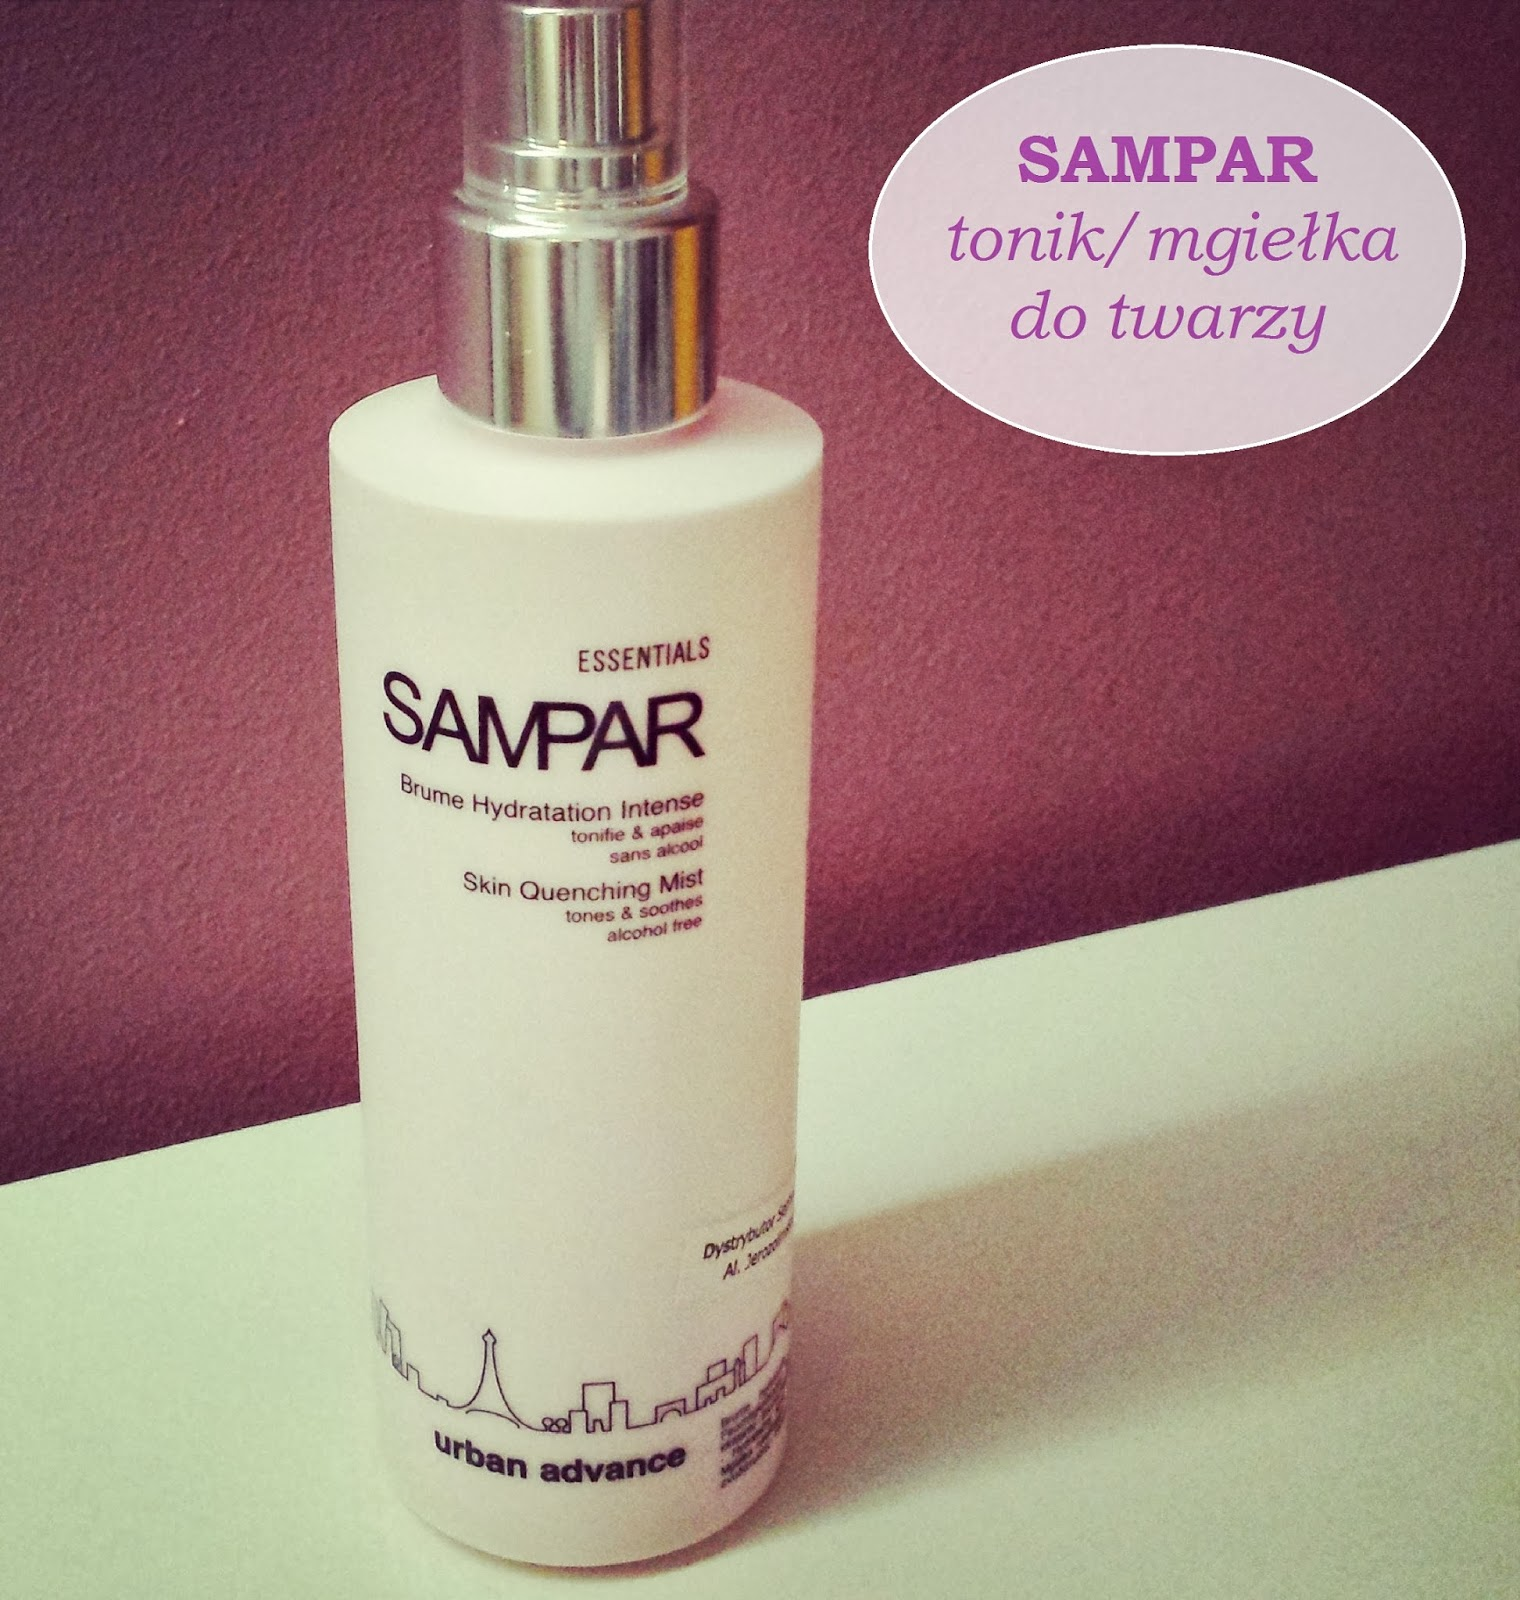 SAMPAR - tonik/mgiełka do twarzy